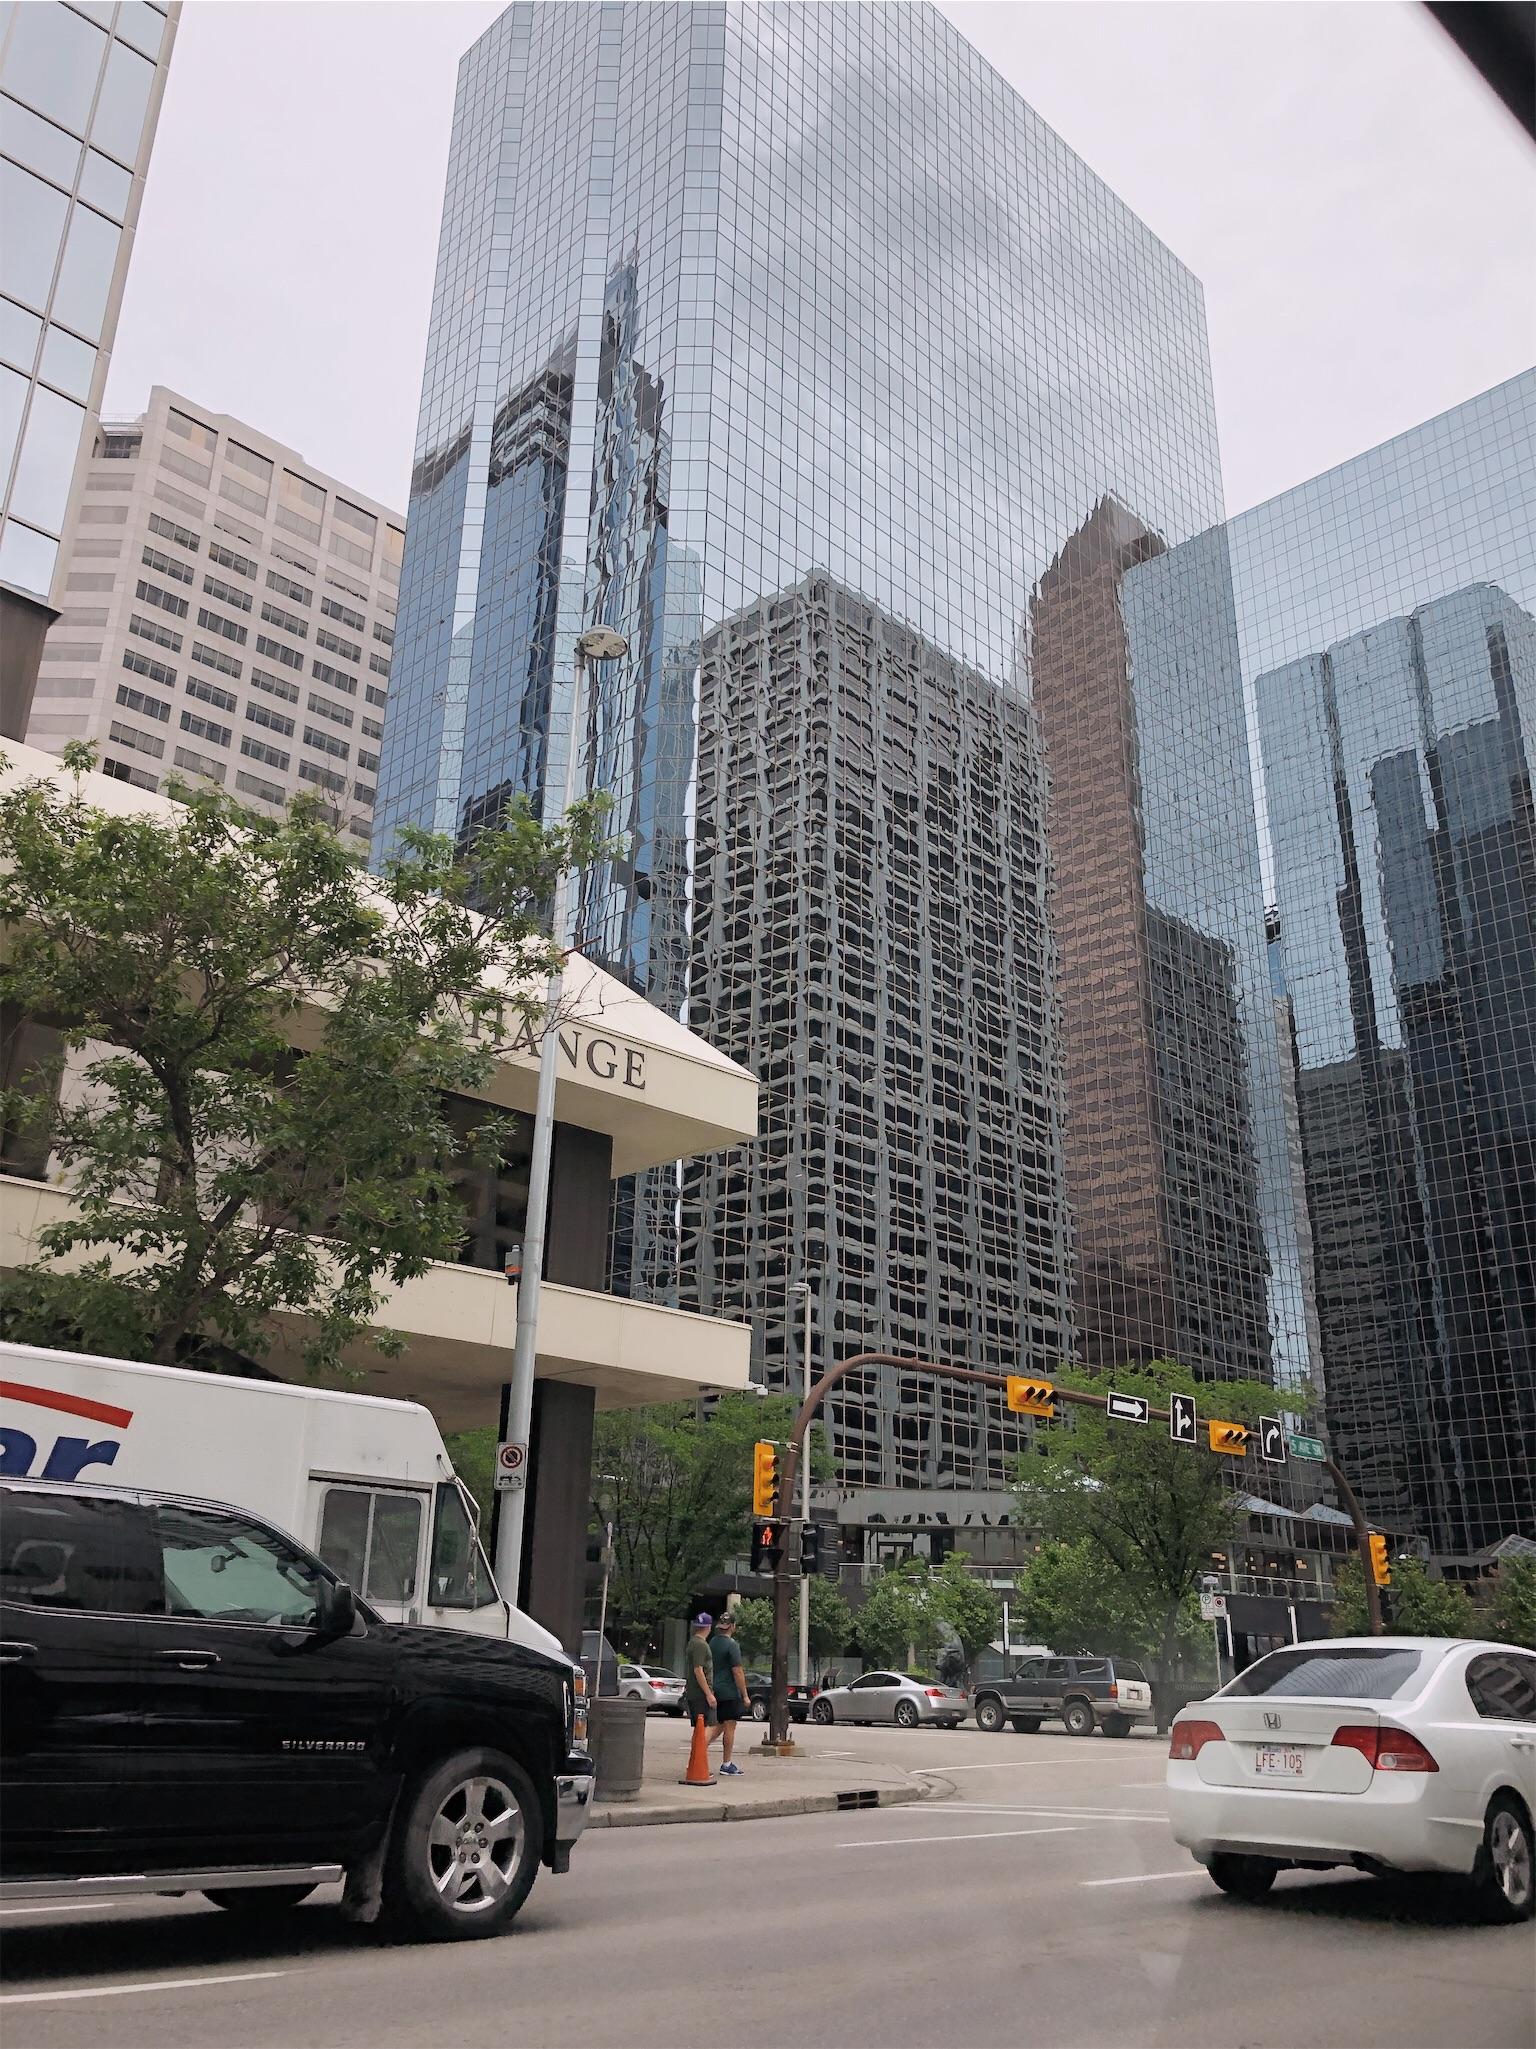 downtown-calgary.jpg